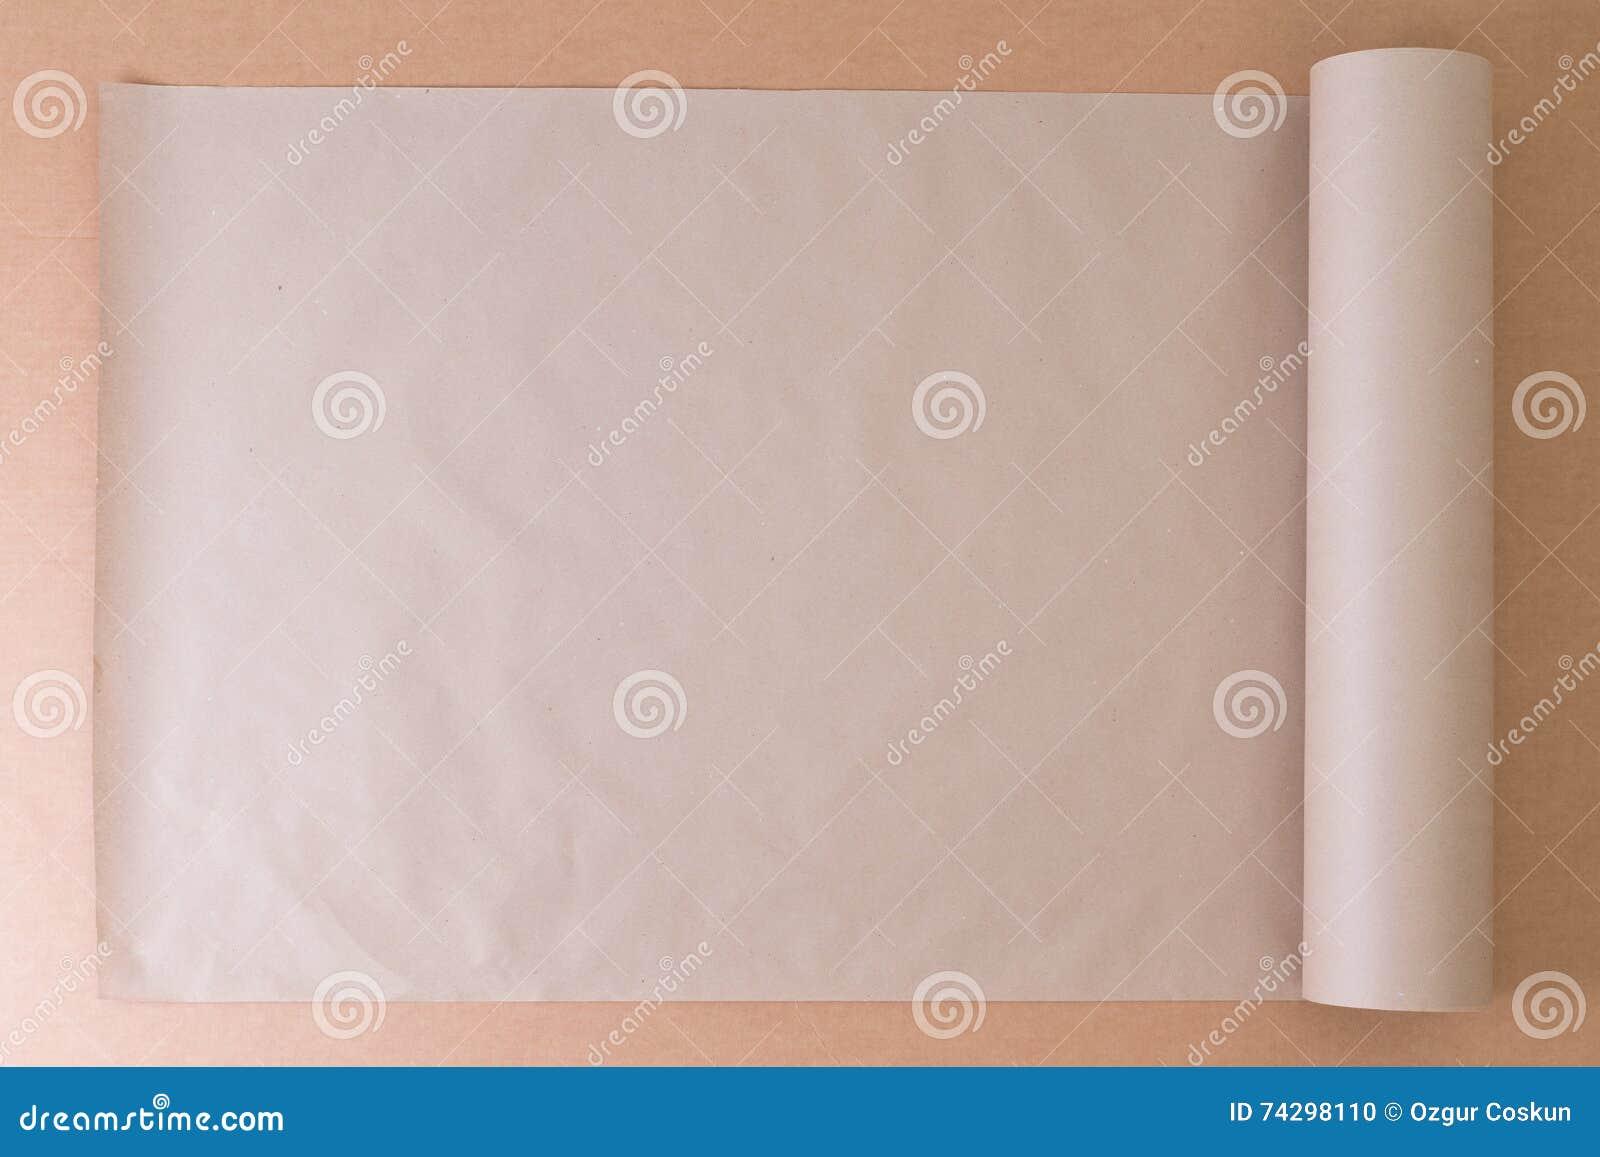 Opened roll of plain brown paper on cardboard stock photo image opened roll of plain brown paper on cardboard jeuxipadfo Choice Image